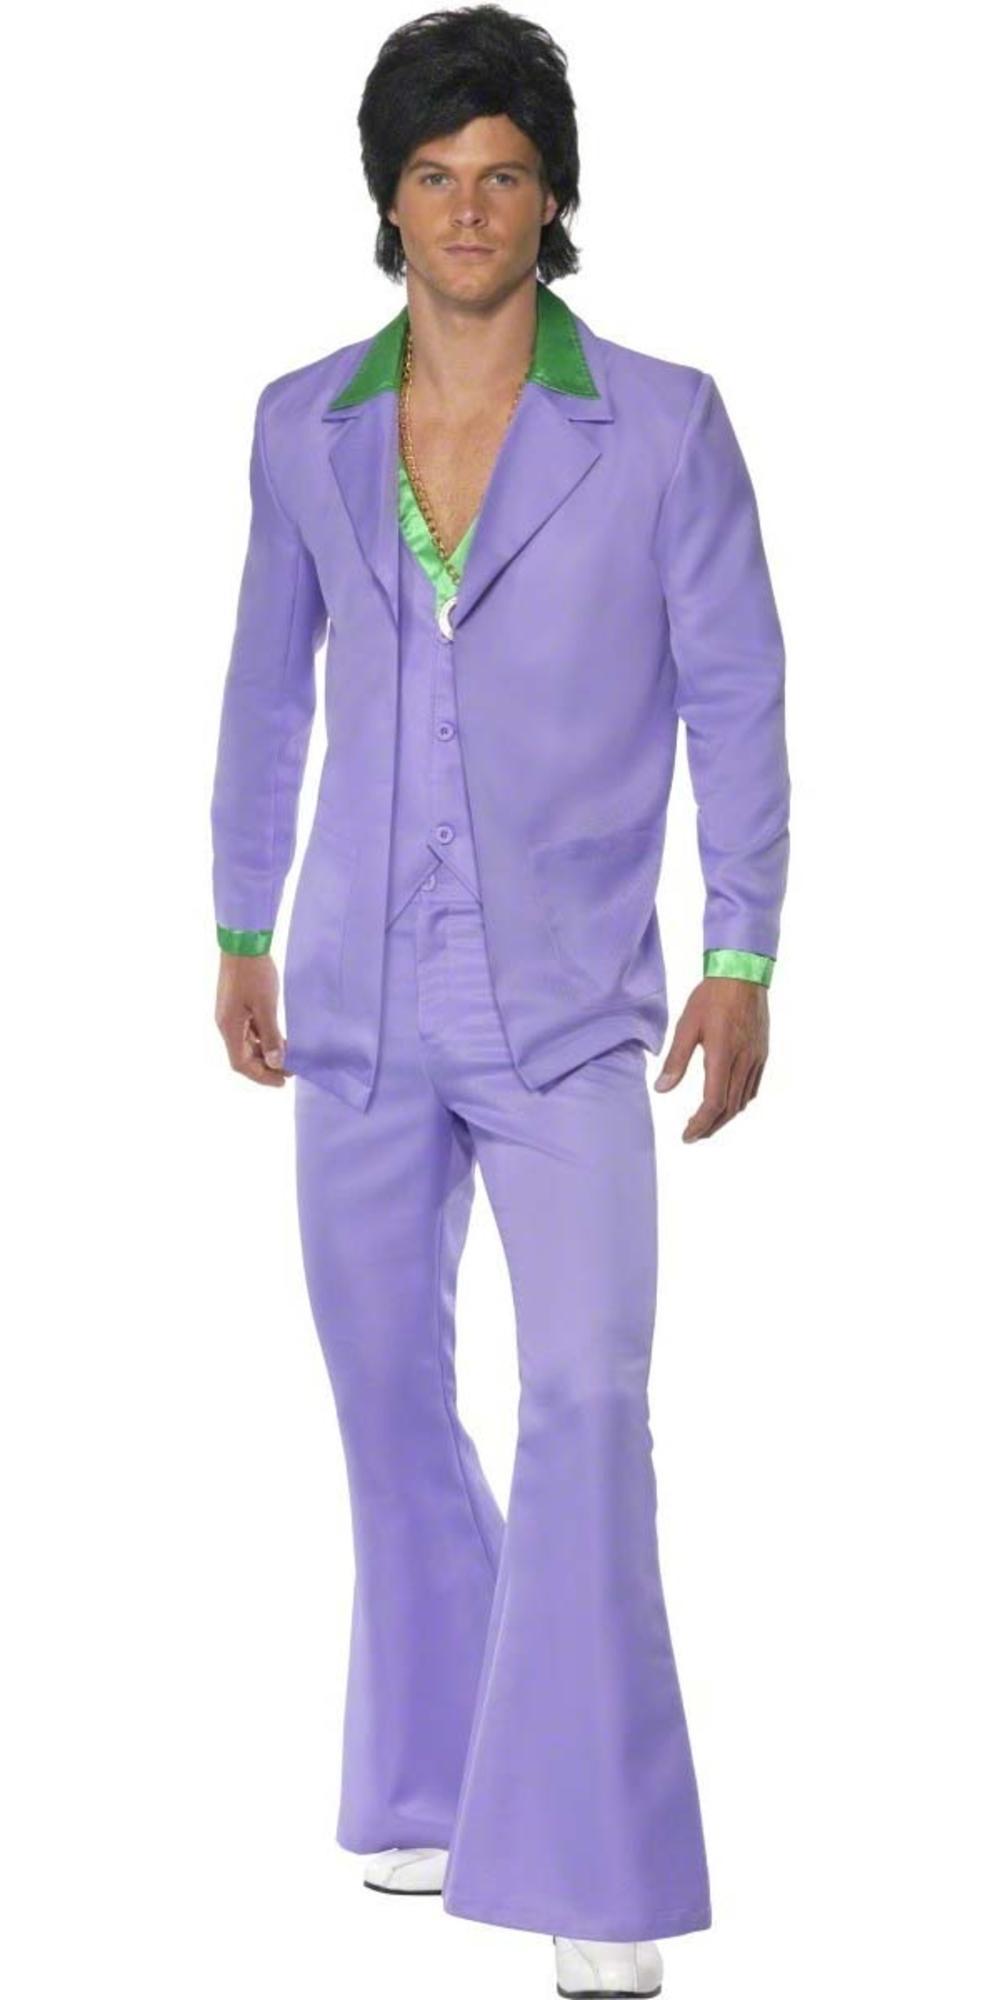 70s Lavender Suit Costume